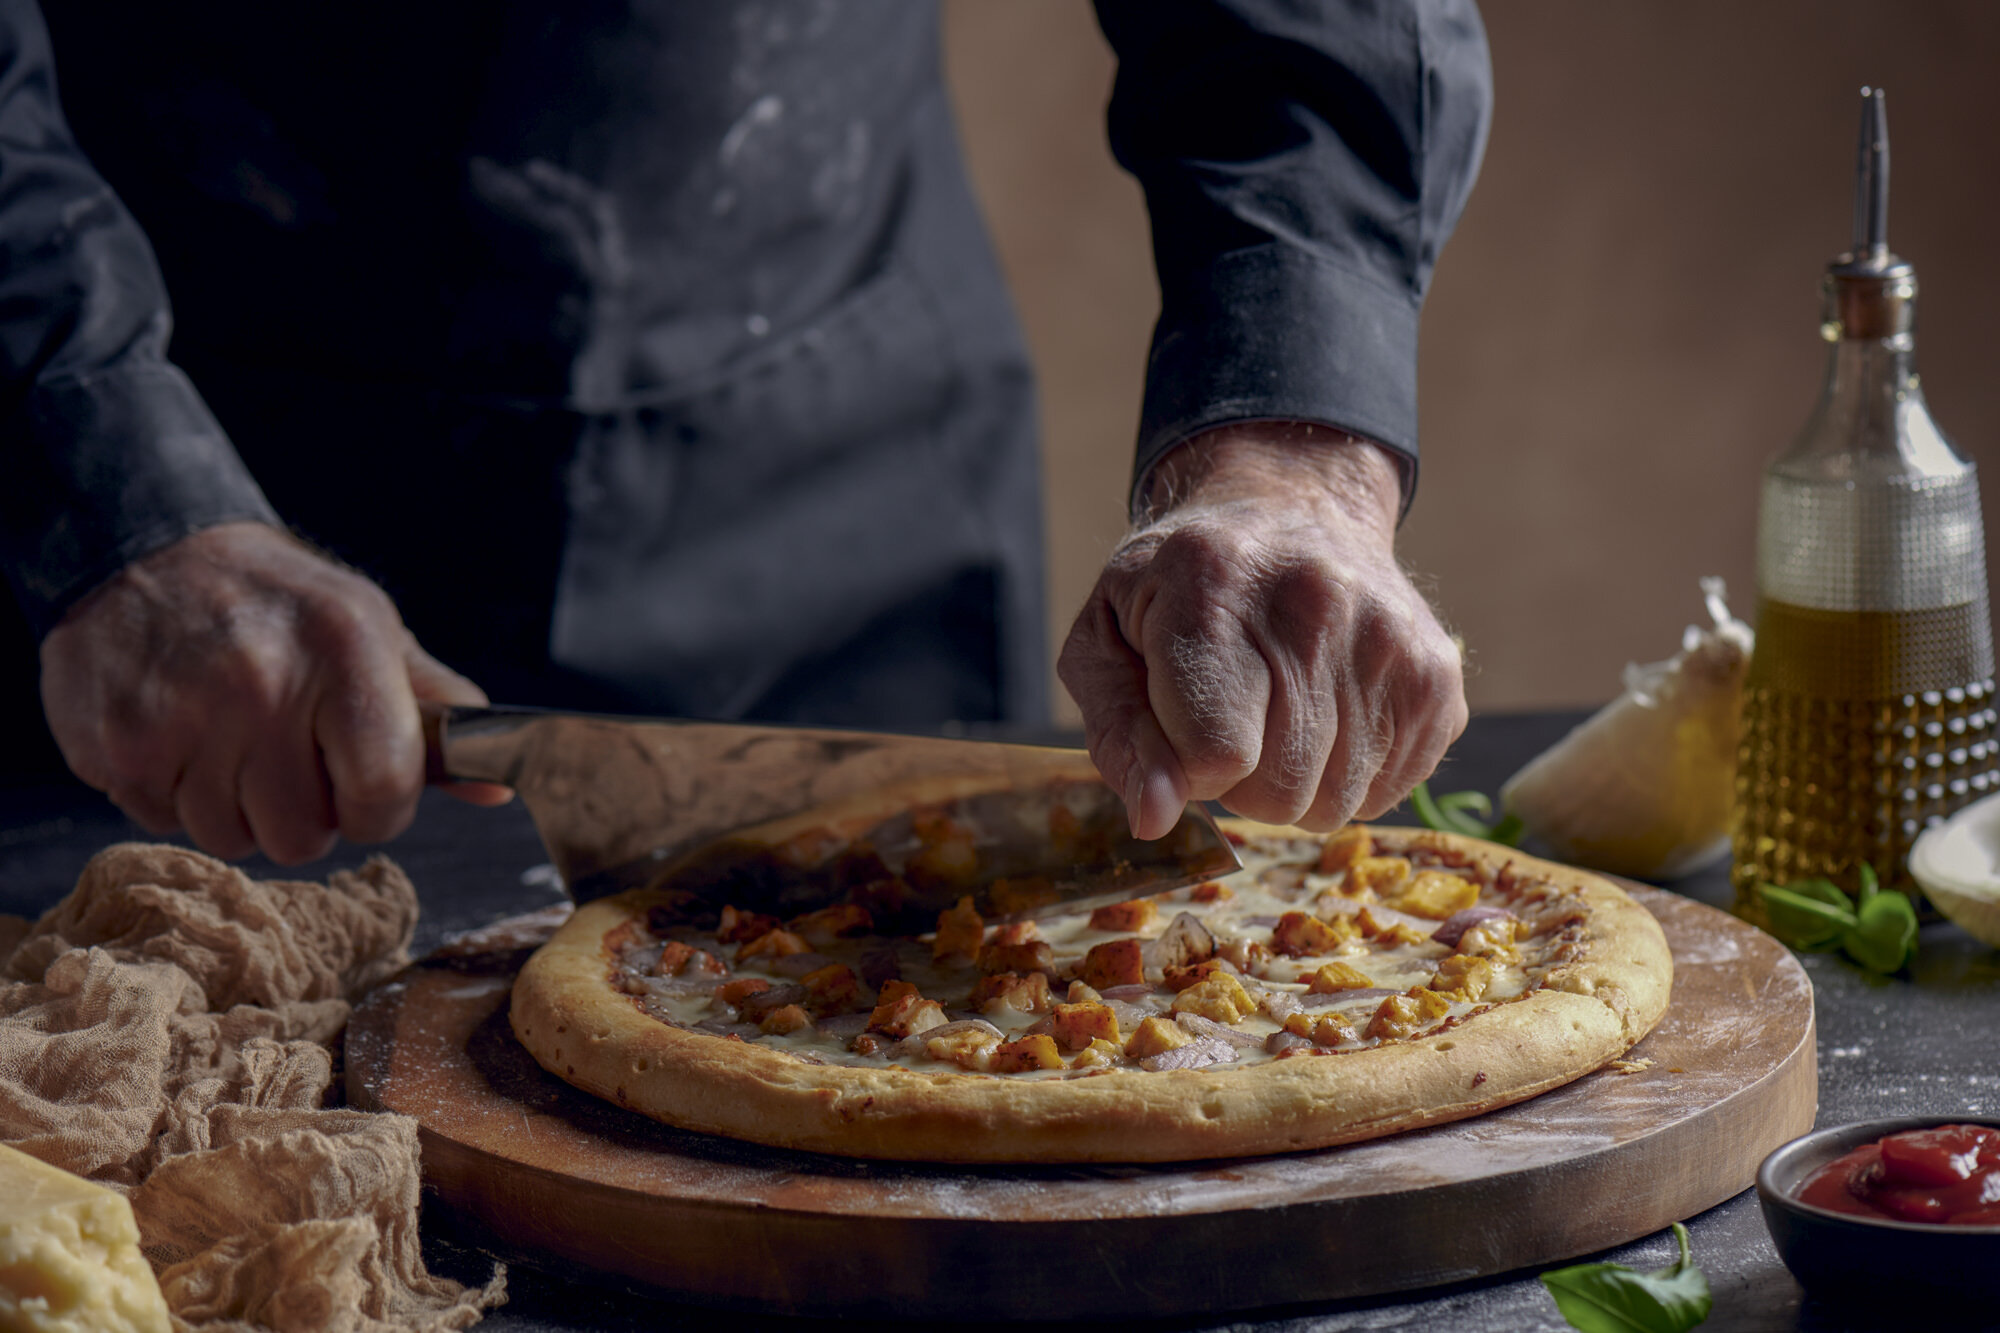 CIP_Pizza Lifestyle-5020-WebResolution.jpg